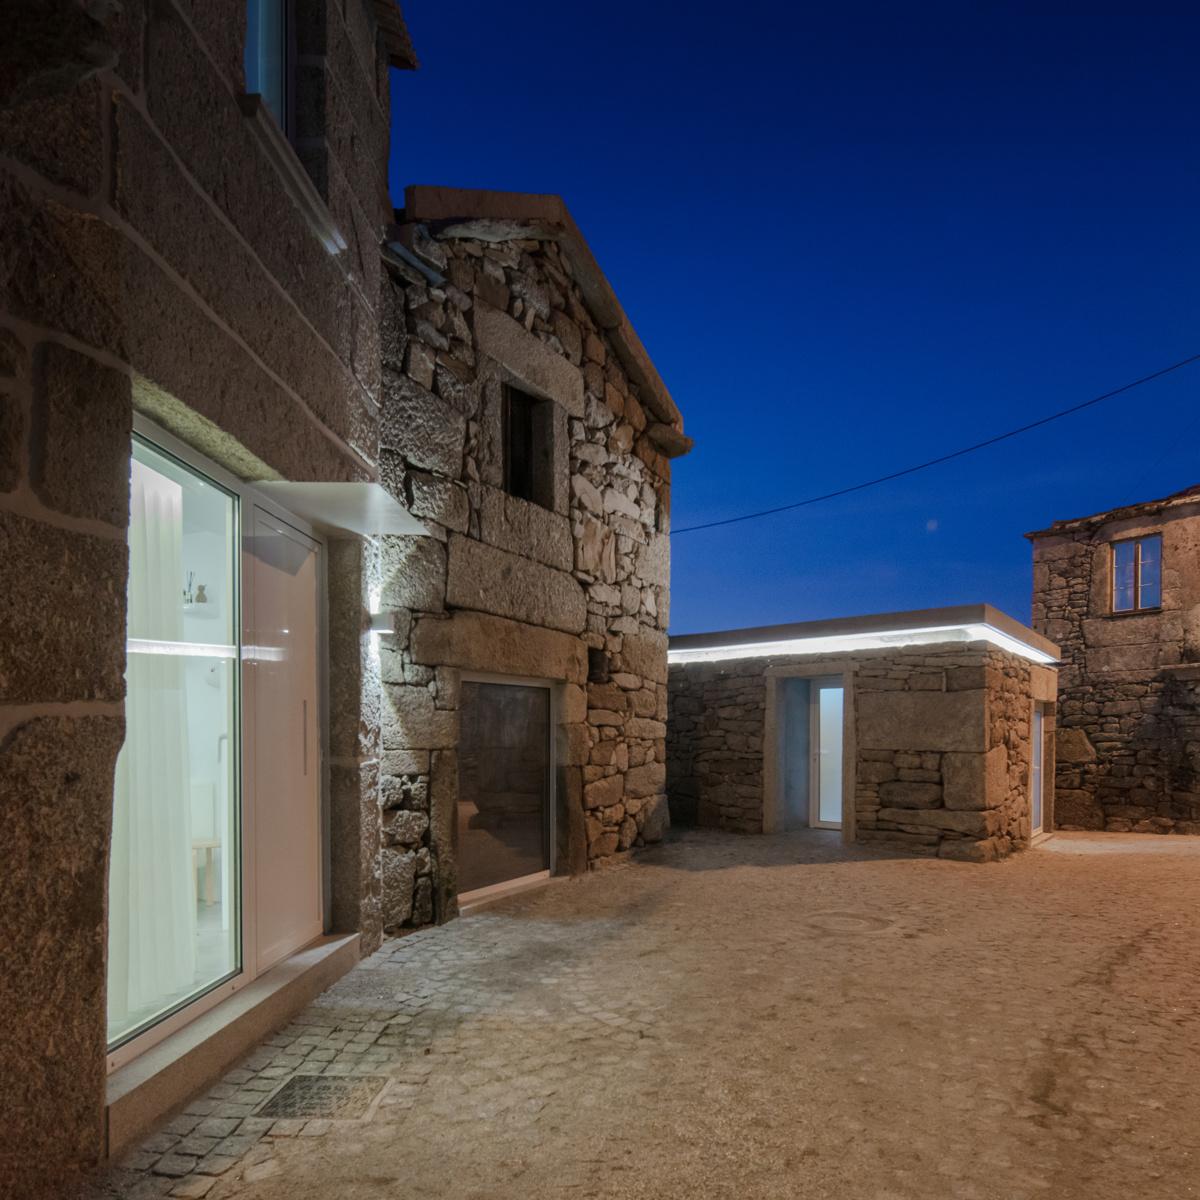 Covo Interiors (Португалия). Старый новый дом